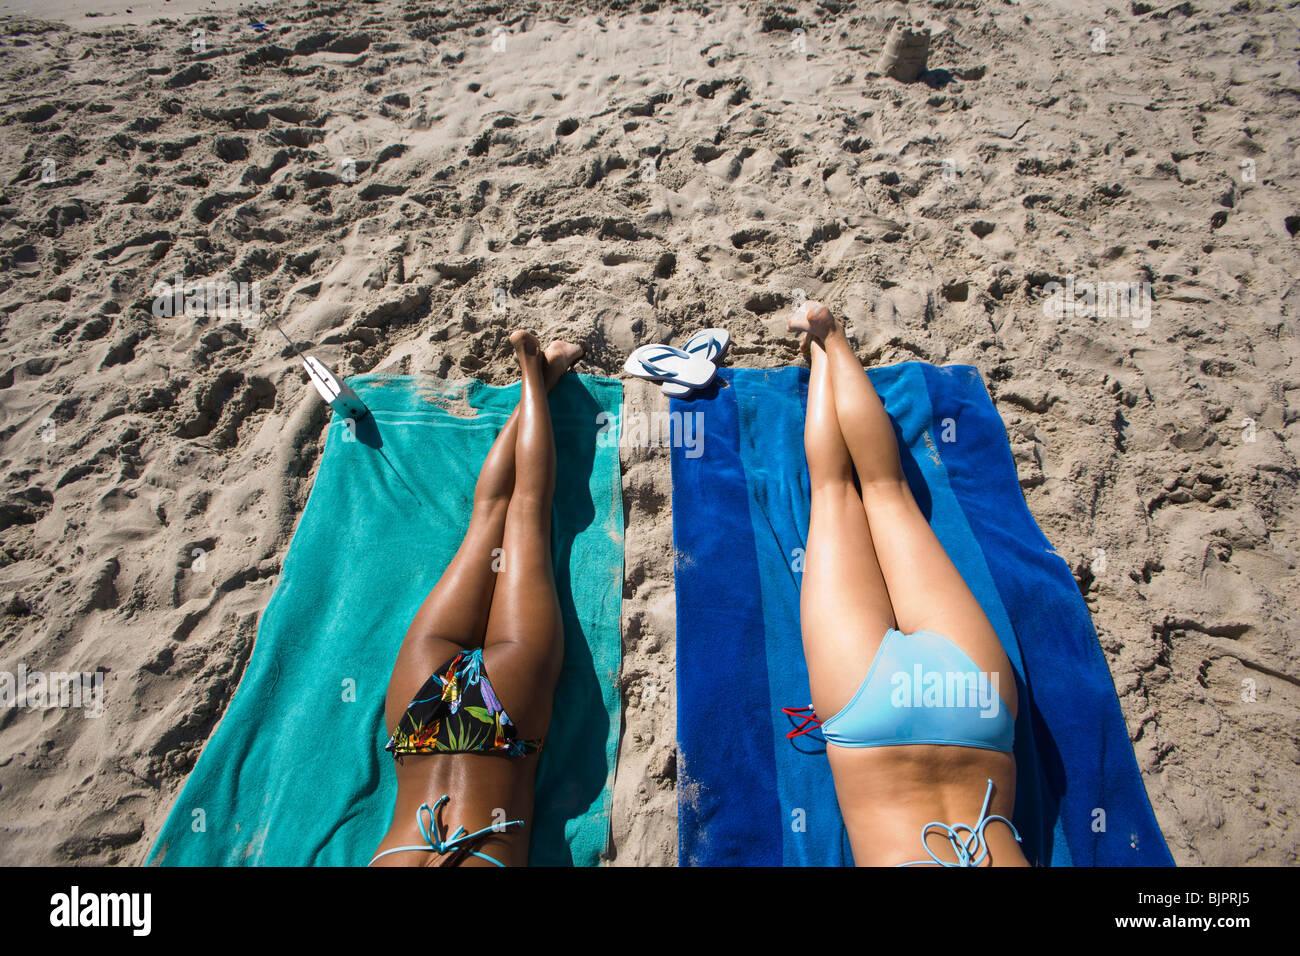 Legs of two women sunbathing at the beach - Stock Image